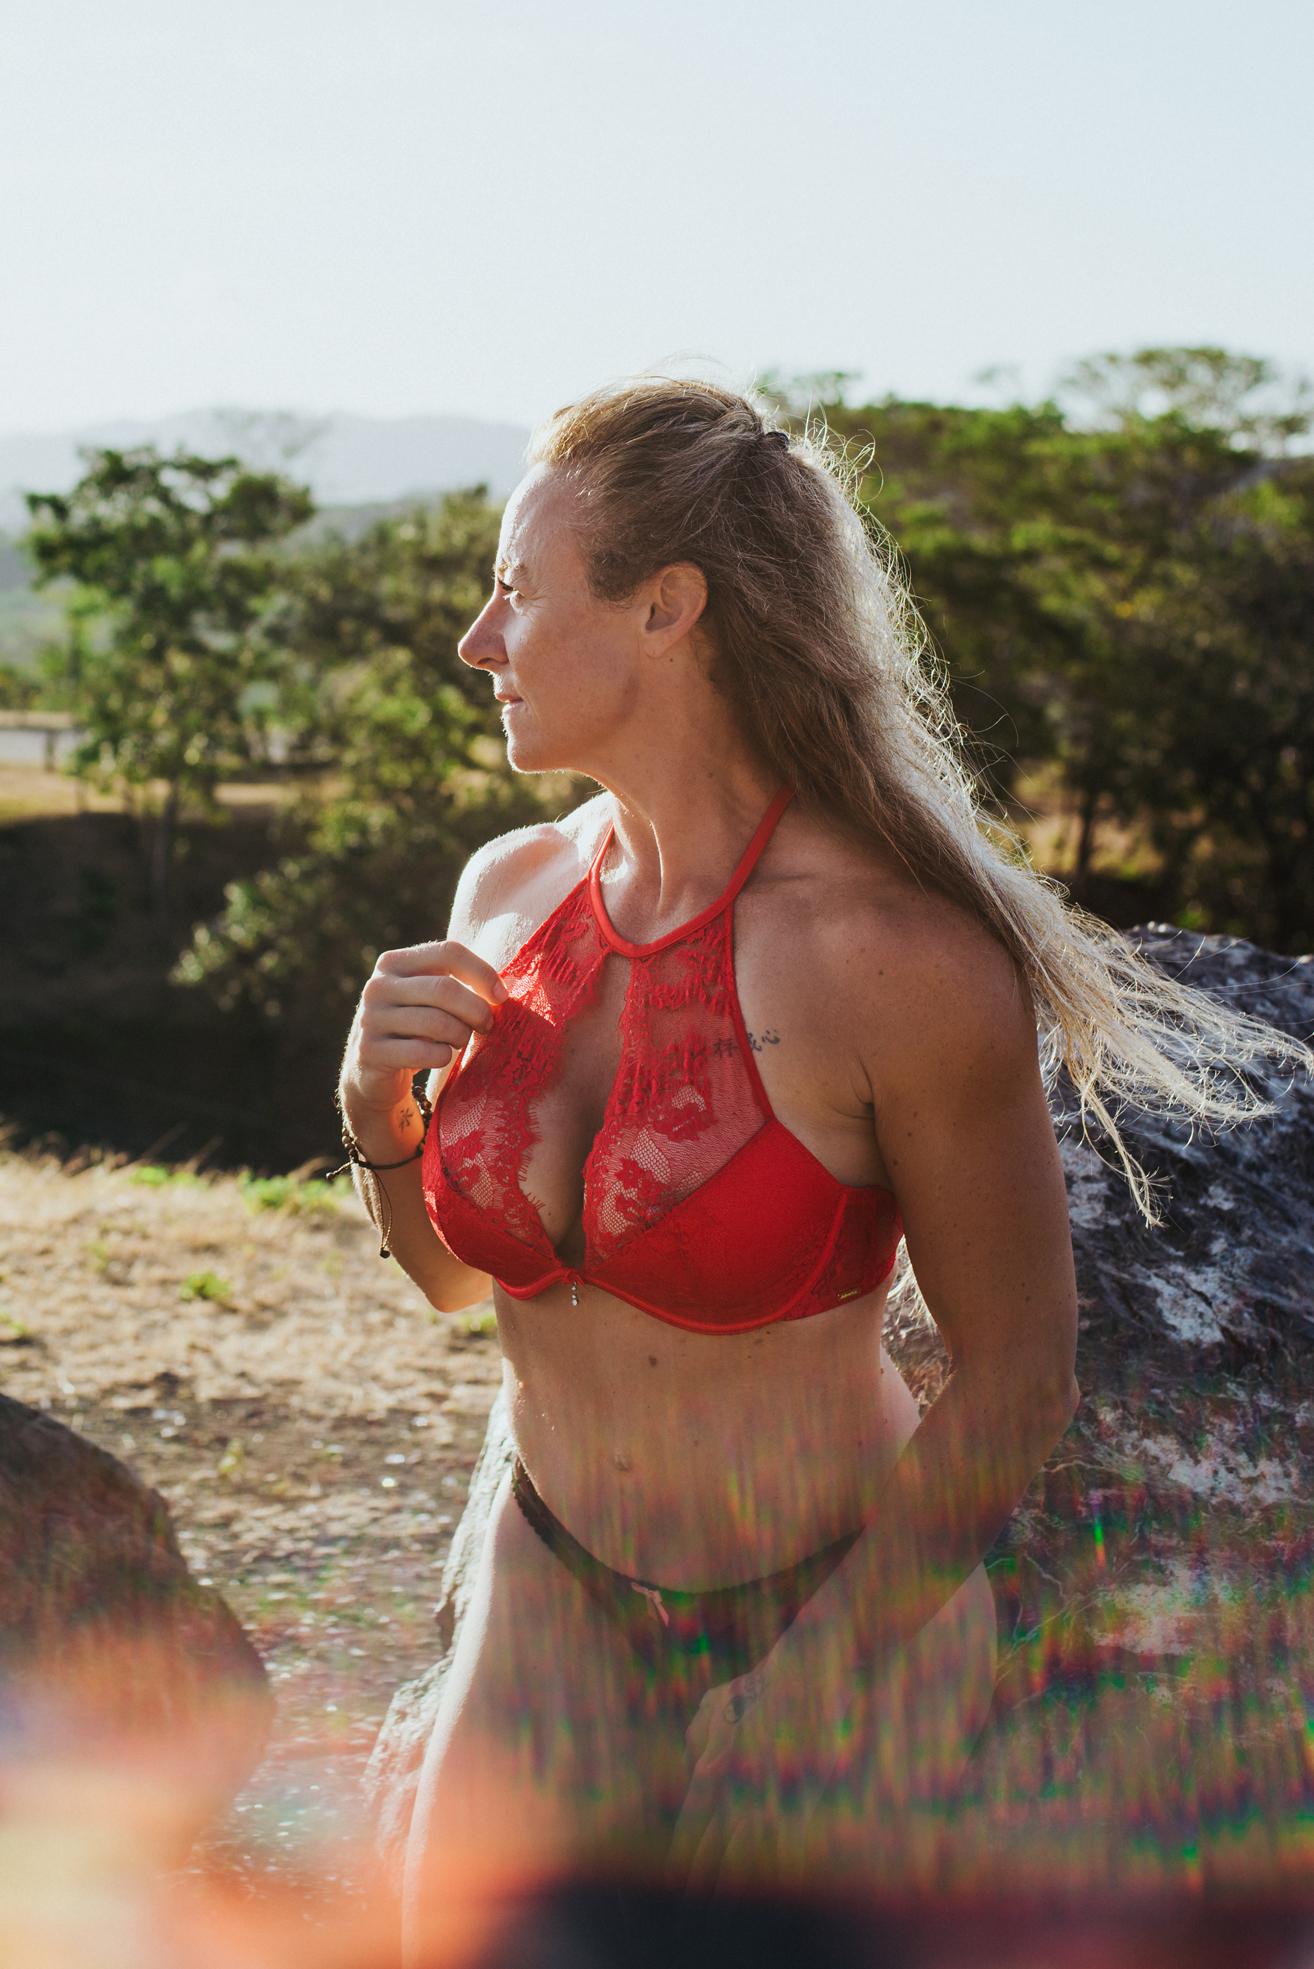 boudoir photographer- toronto-scandaleuse photography-boudoir photography-costa rica-toronto blog-blogger-woman-sexy-erotism-erotic-nude